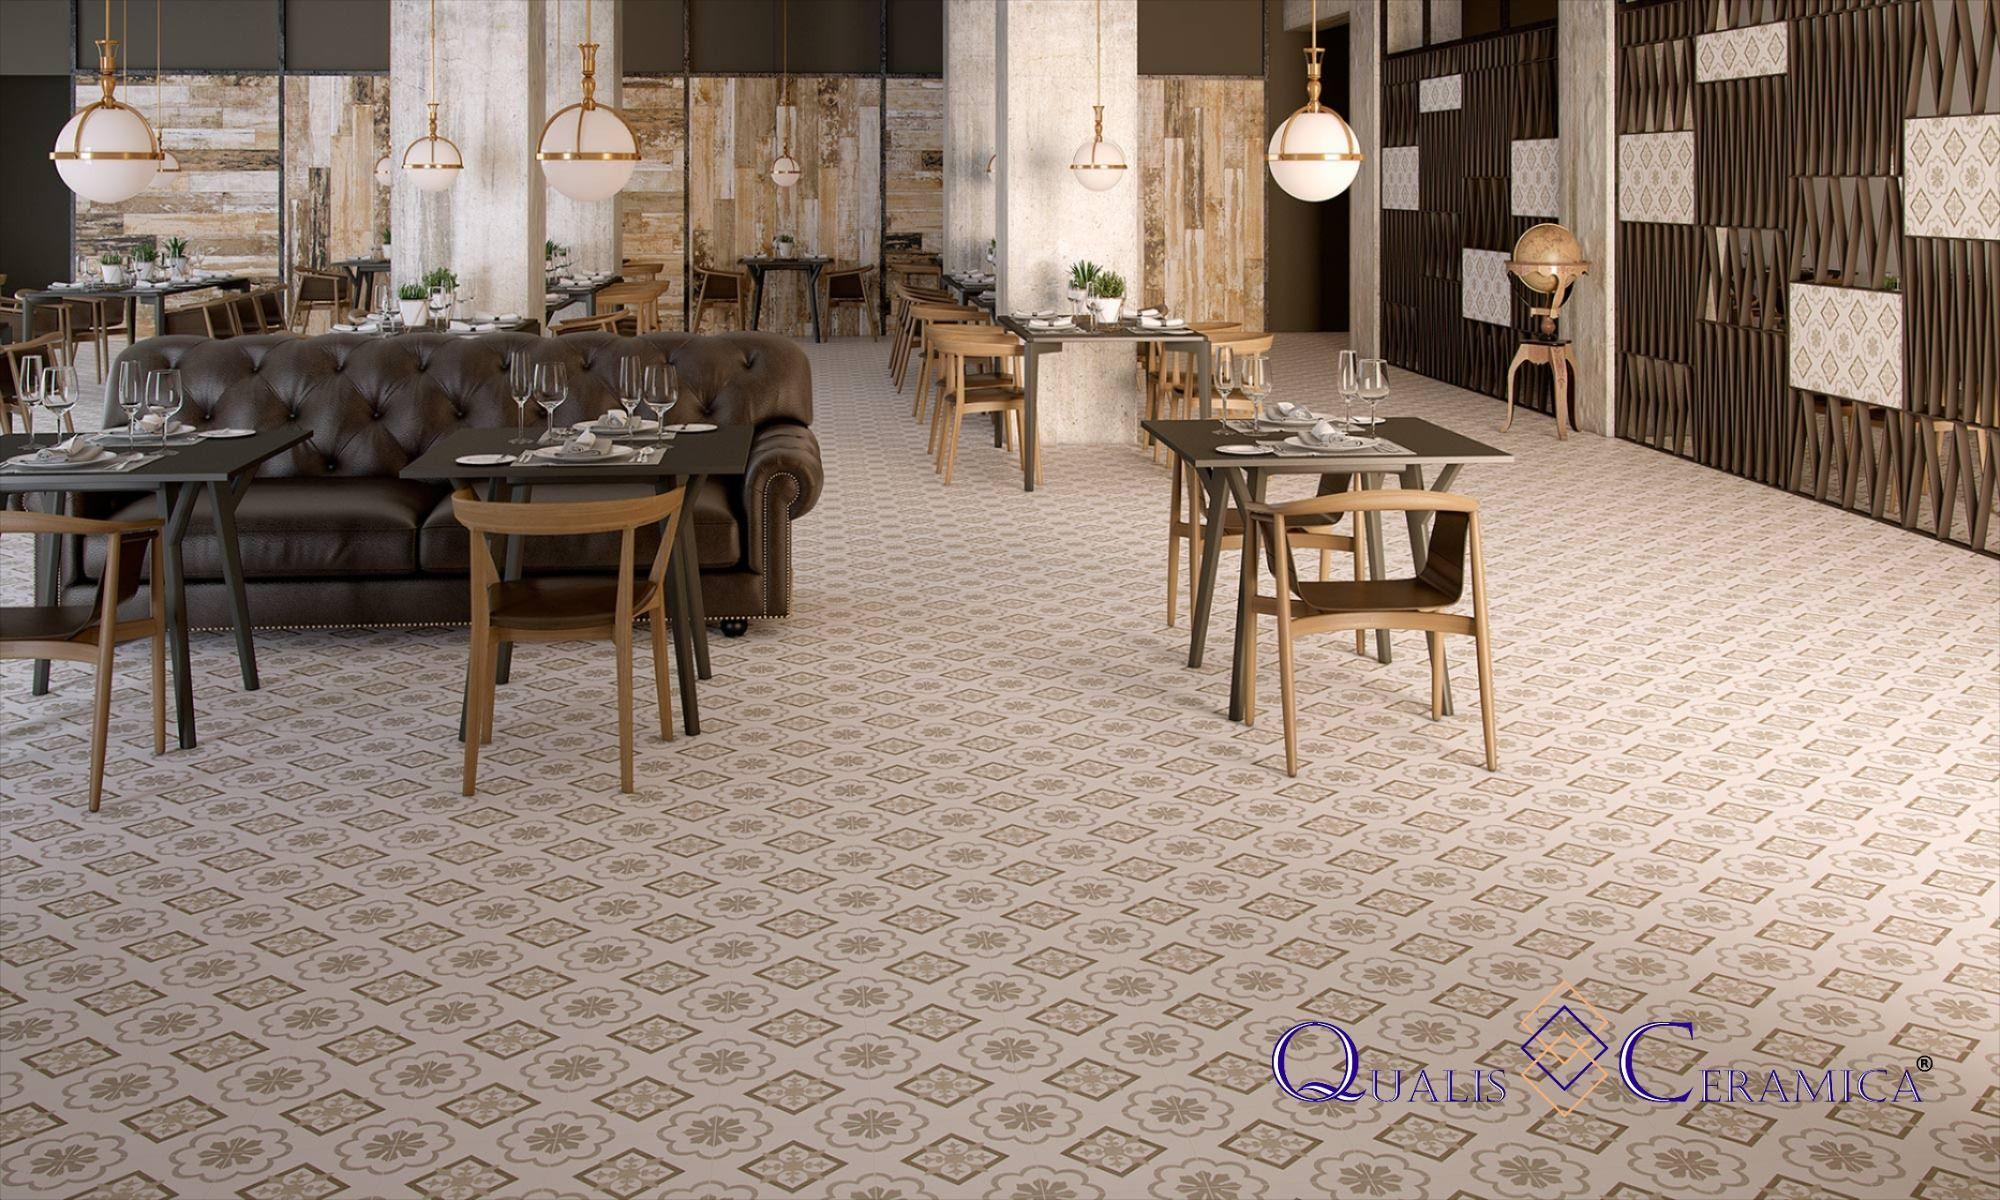 Qualis Ceramica Gibraltar Catalan Beige 10x10 Dining Floor And Wall Cement Look Porcelain Tile Entryway Flooring Tile Design Slip Resistant Tiles